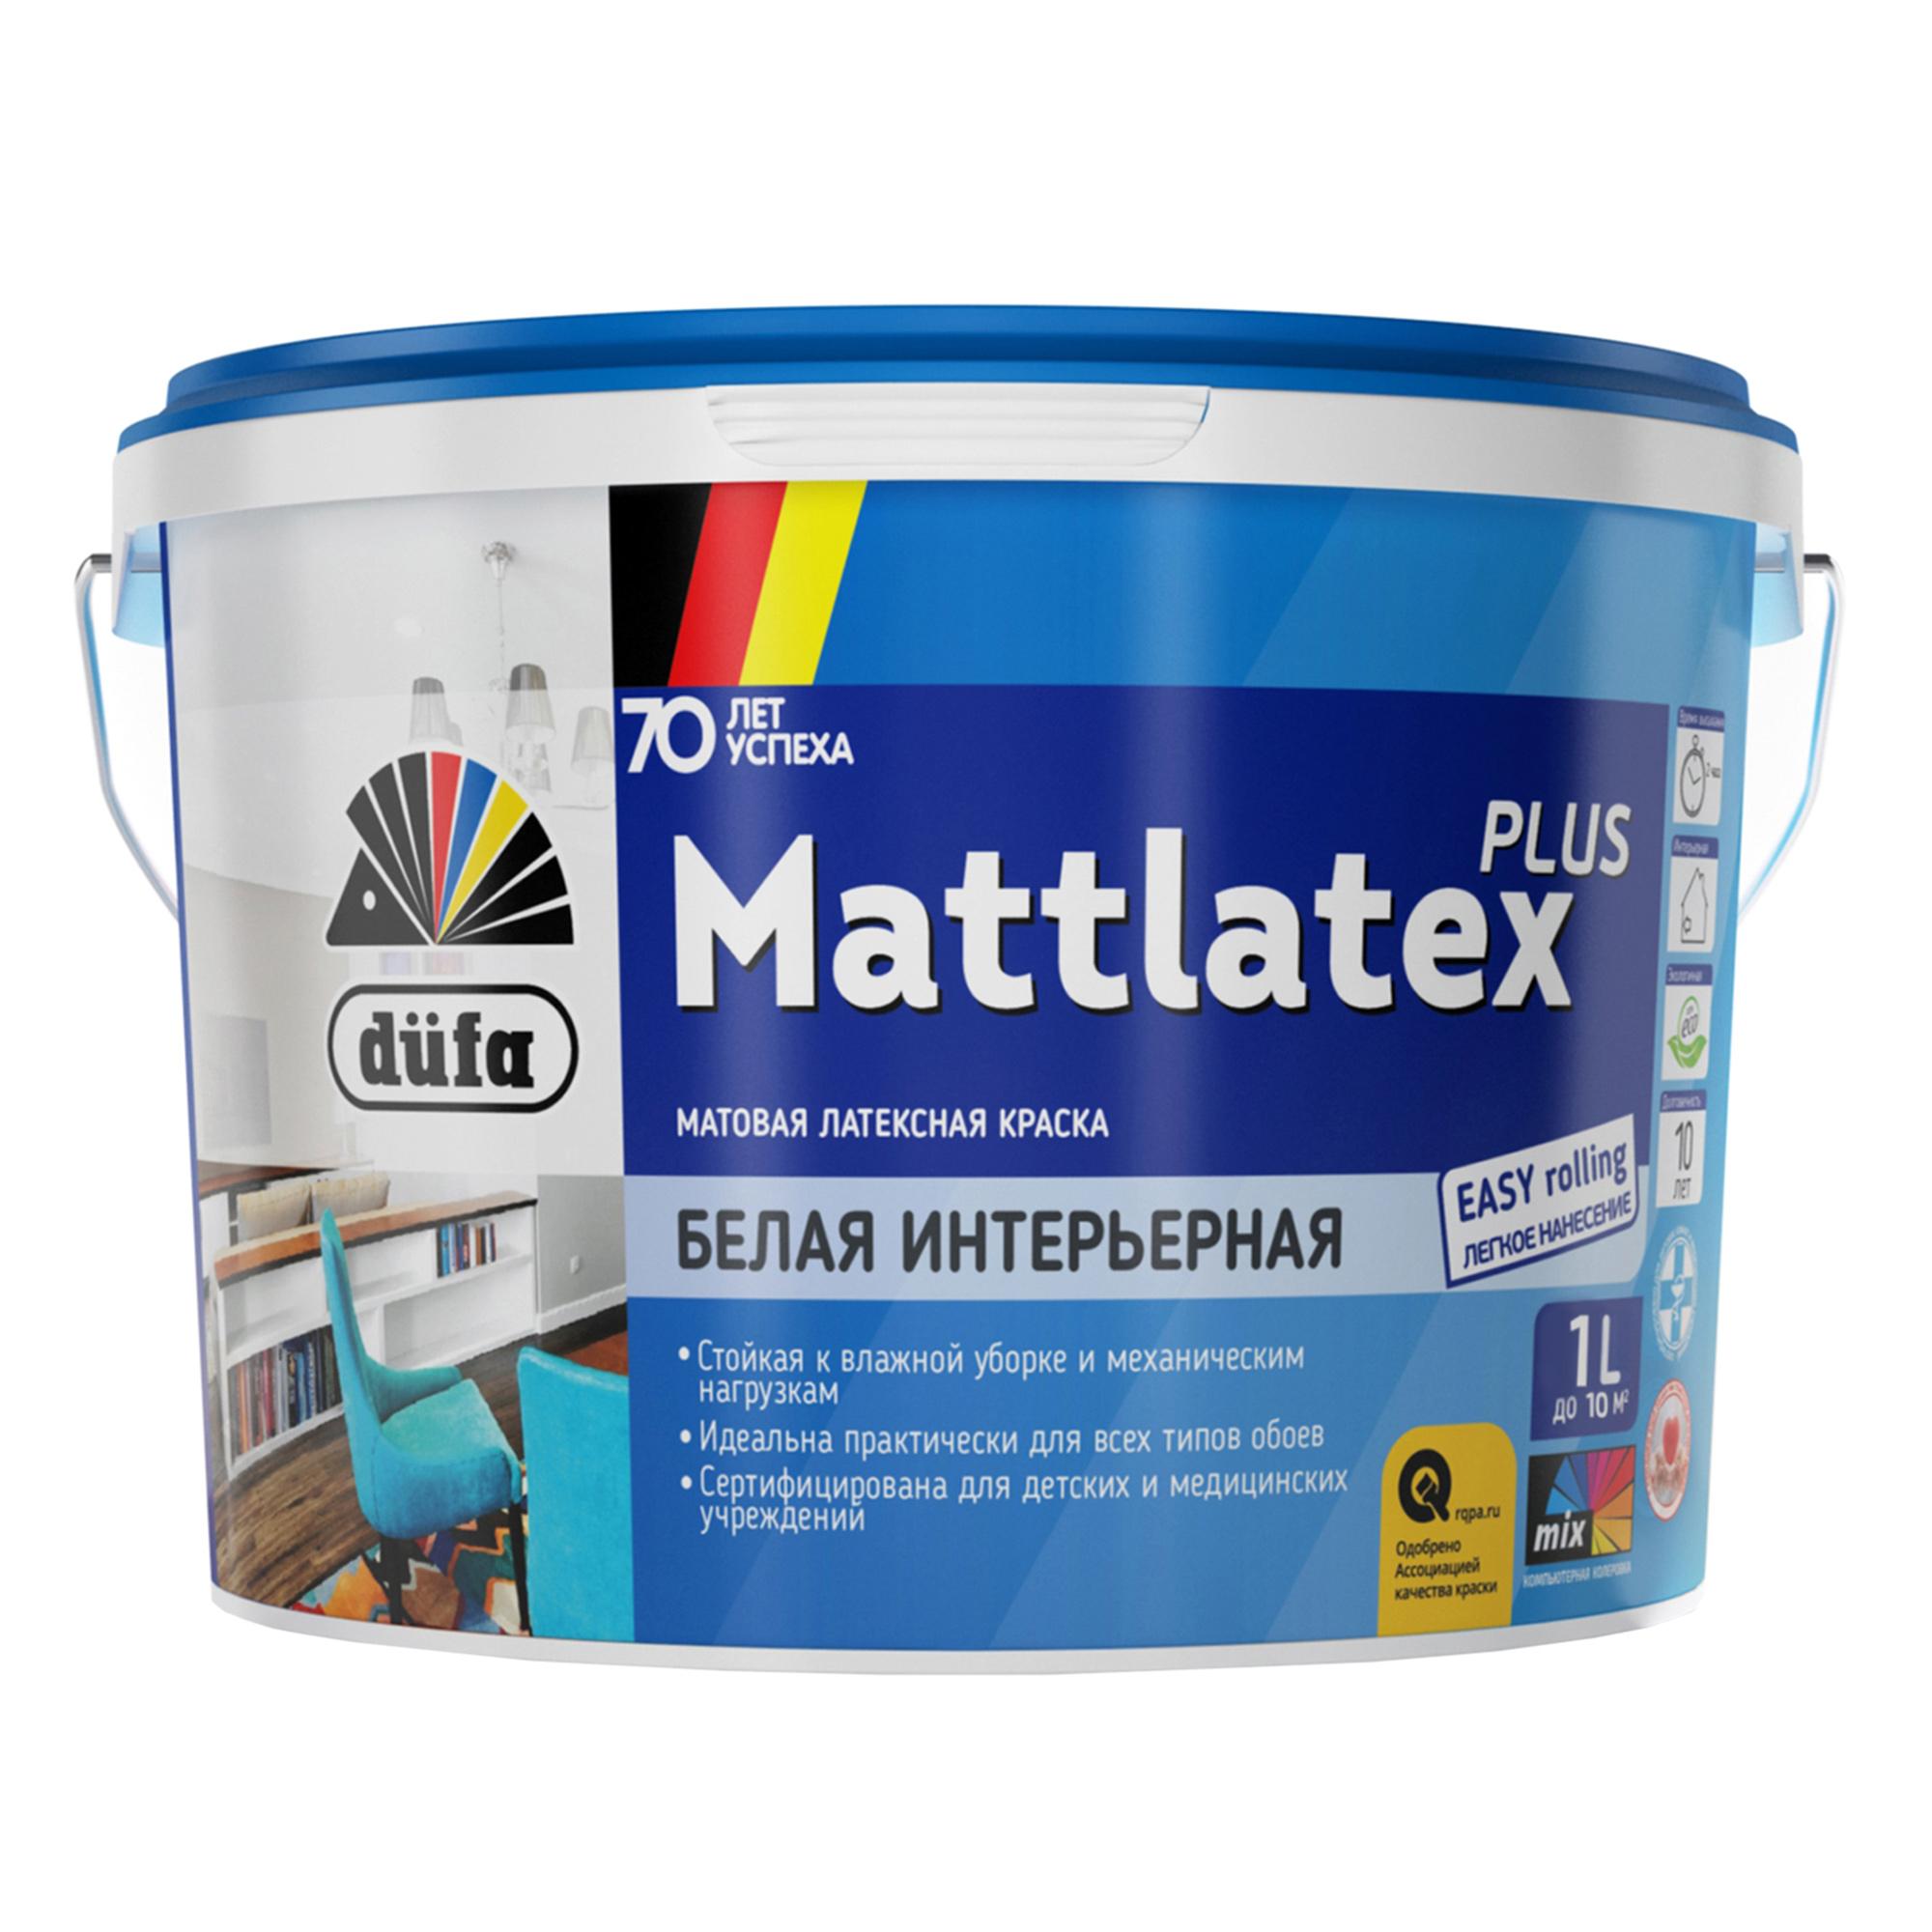 Краска Dufa Retail Mattlatex Plus матовая белая 1 л. фото